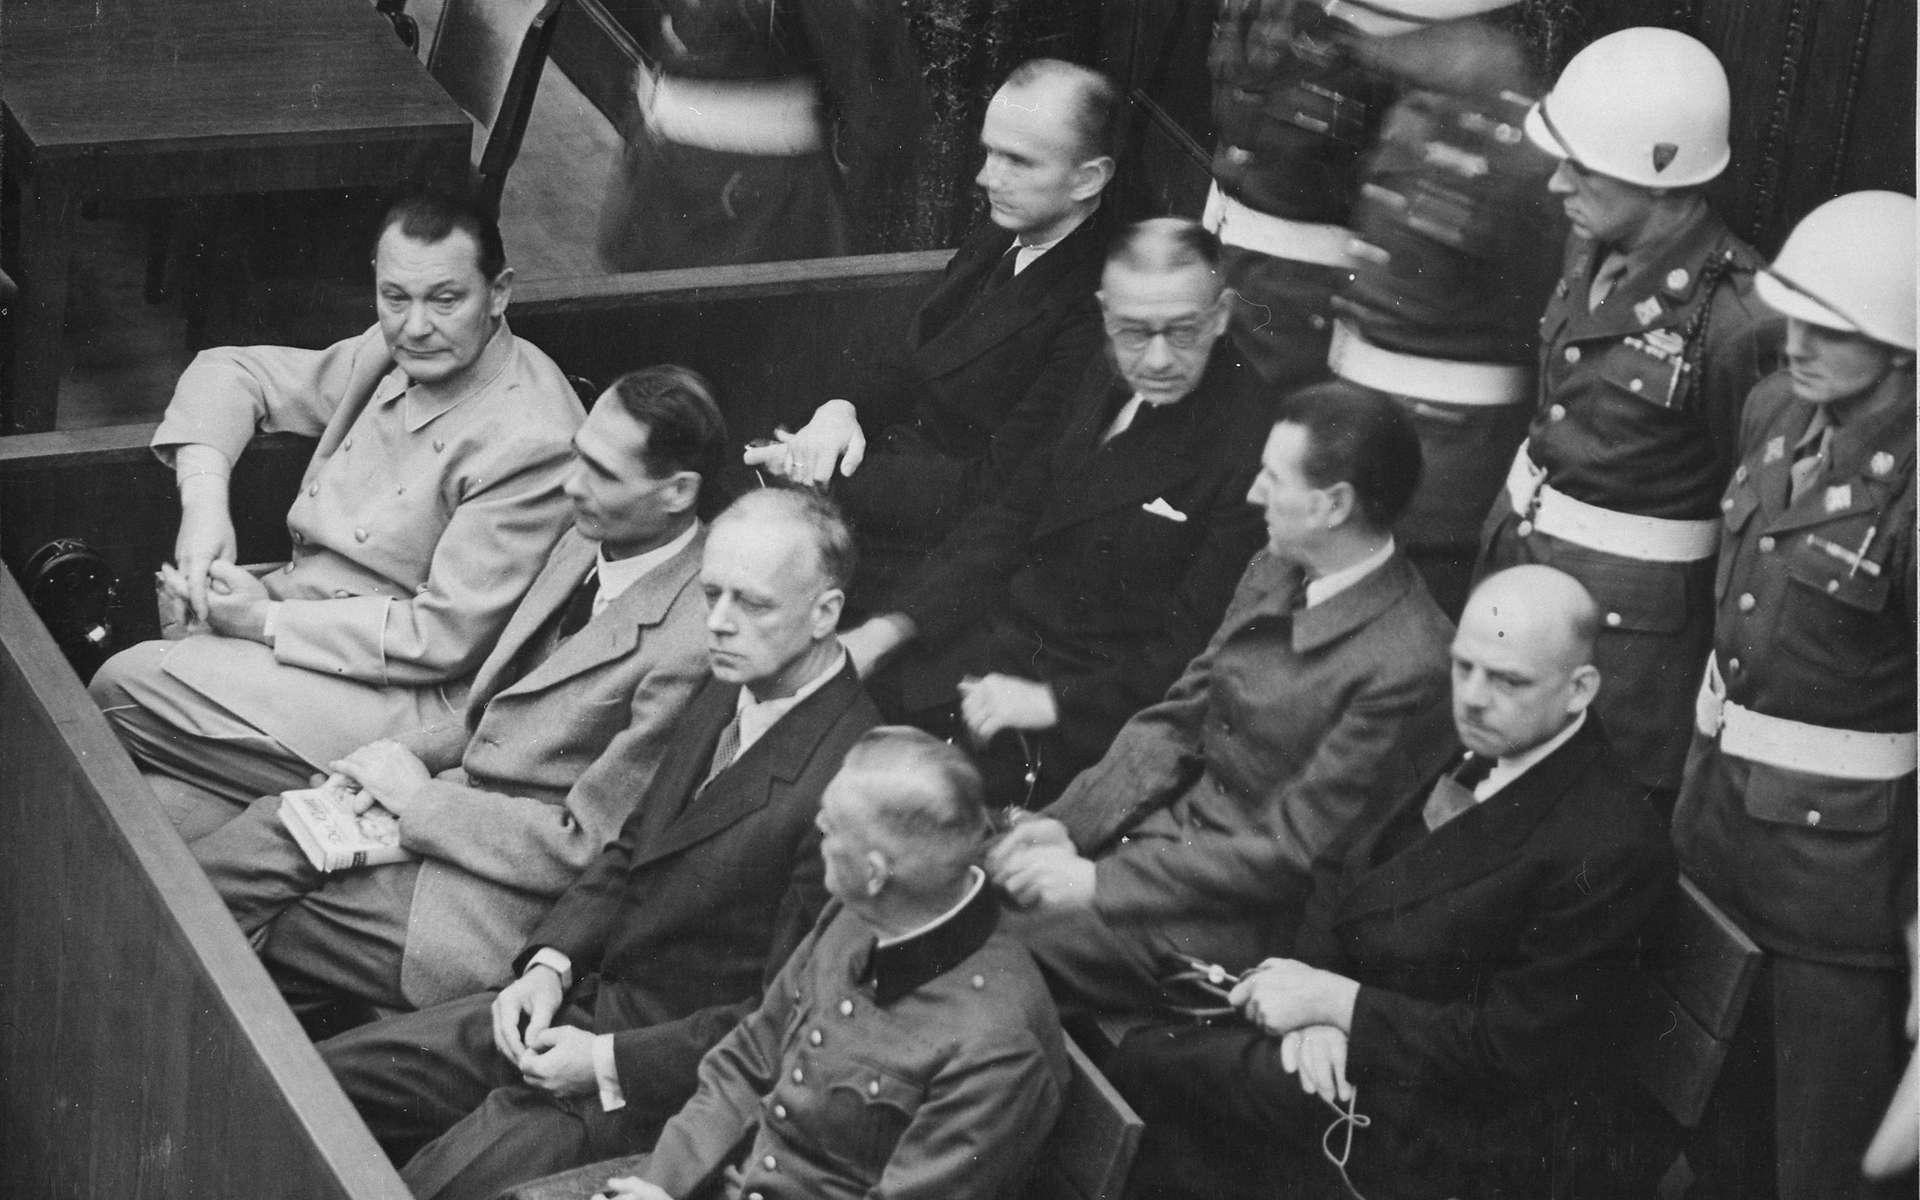 Des accusés lors du procès de Nuremberg. Au premier rang, de gauche à droite, Hermann Göring, Rudolf Hess, Joachim von Ribbentrop, Wilhelm Keitel. Au second rang, toujours de gauche à droite, Karl Dönitz, Erich Raeder, Baldur von Schirach, Fritz Sauckel © US Government, Wikimedia Commons, DP